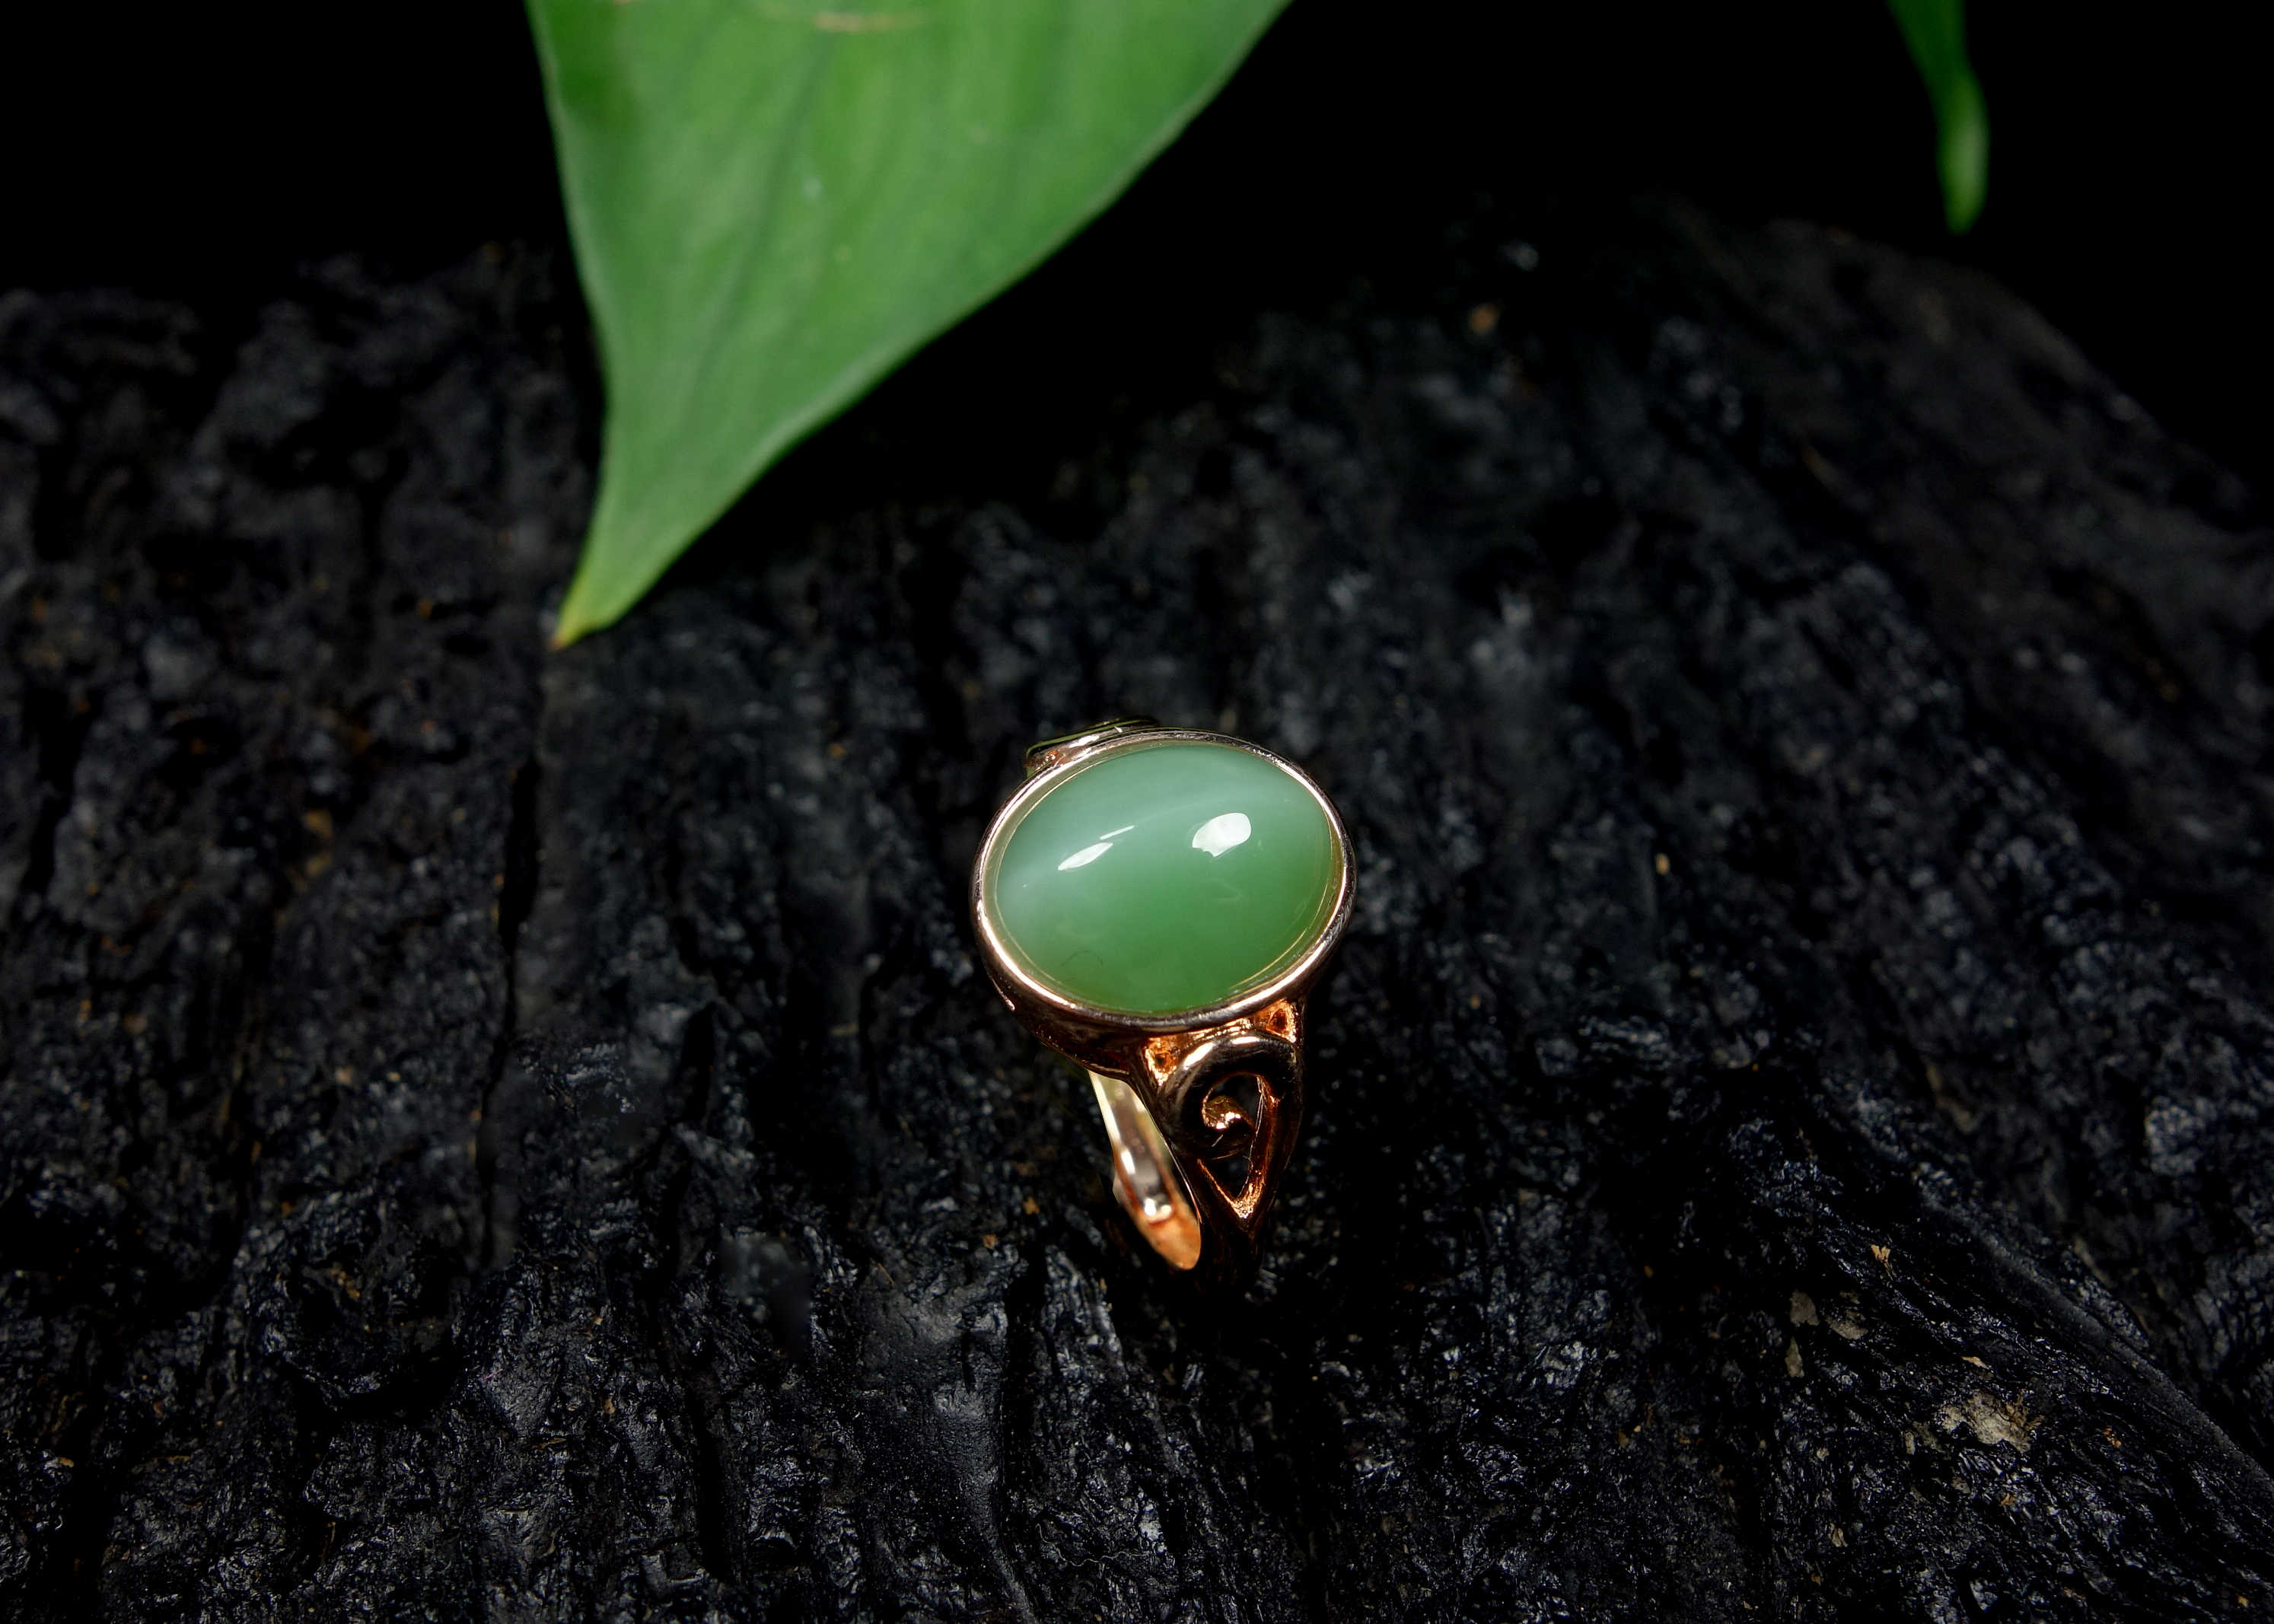 Nephrite jade Jasper S925 แหวนเงินพลอย Home Decor ของขวัญ Reiki Gemstone ผู้หญิงงานแต่งงานครบรอบของขวัญ